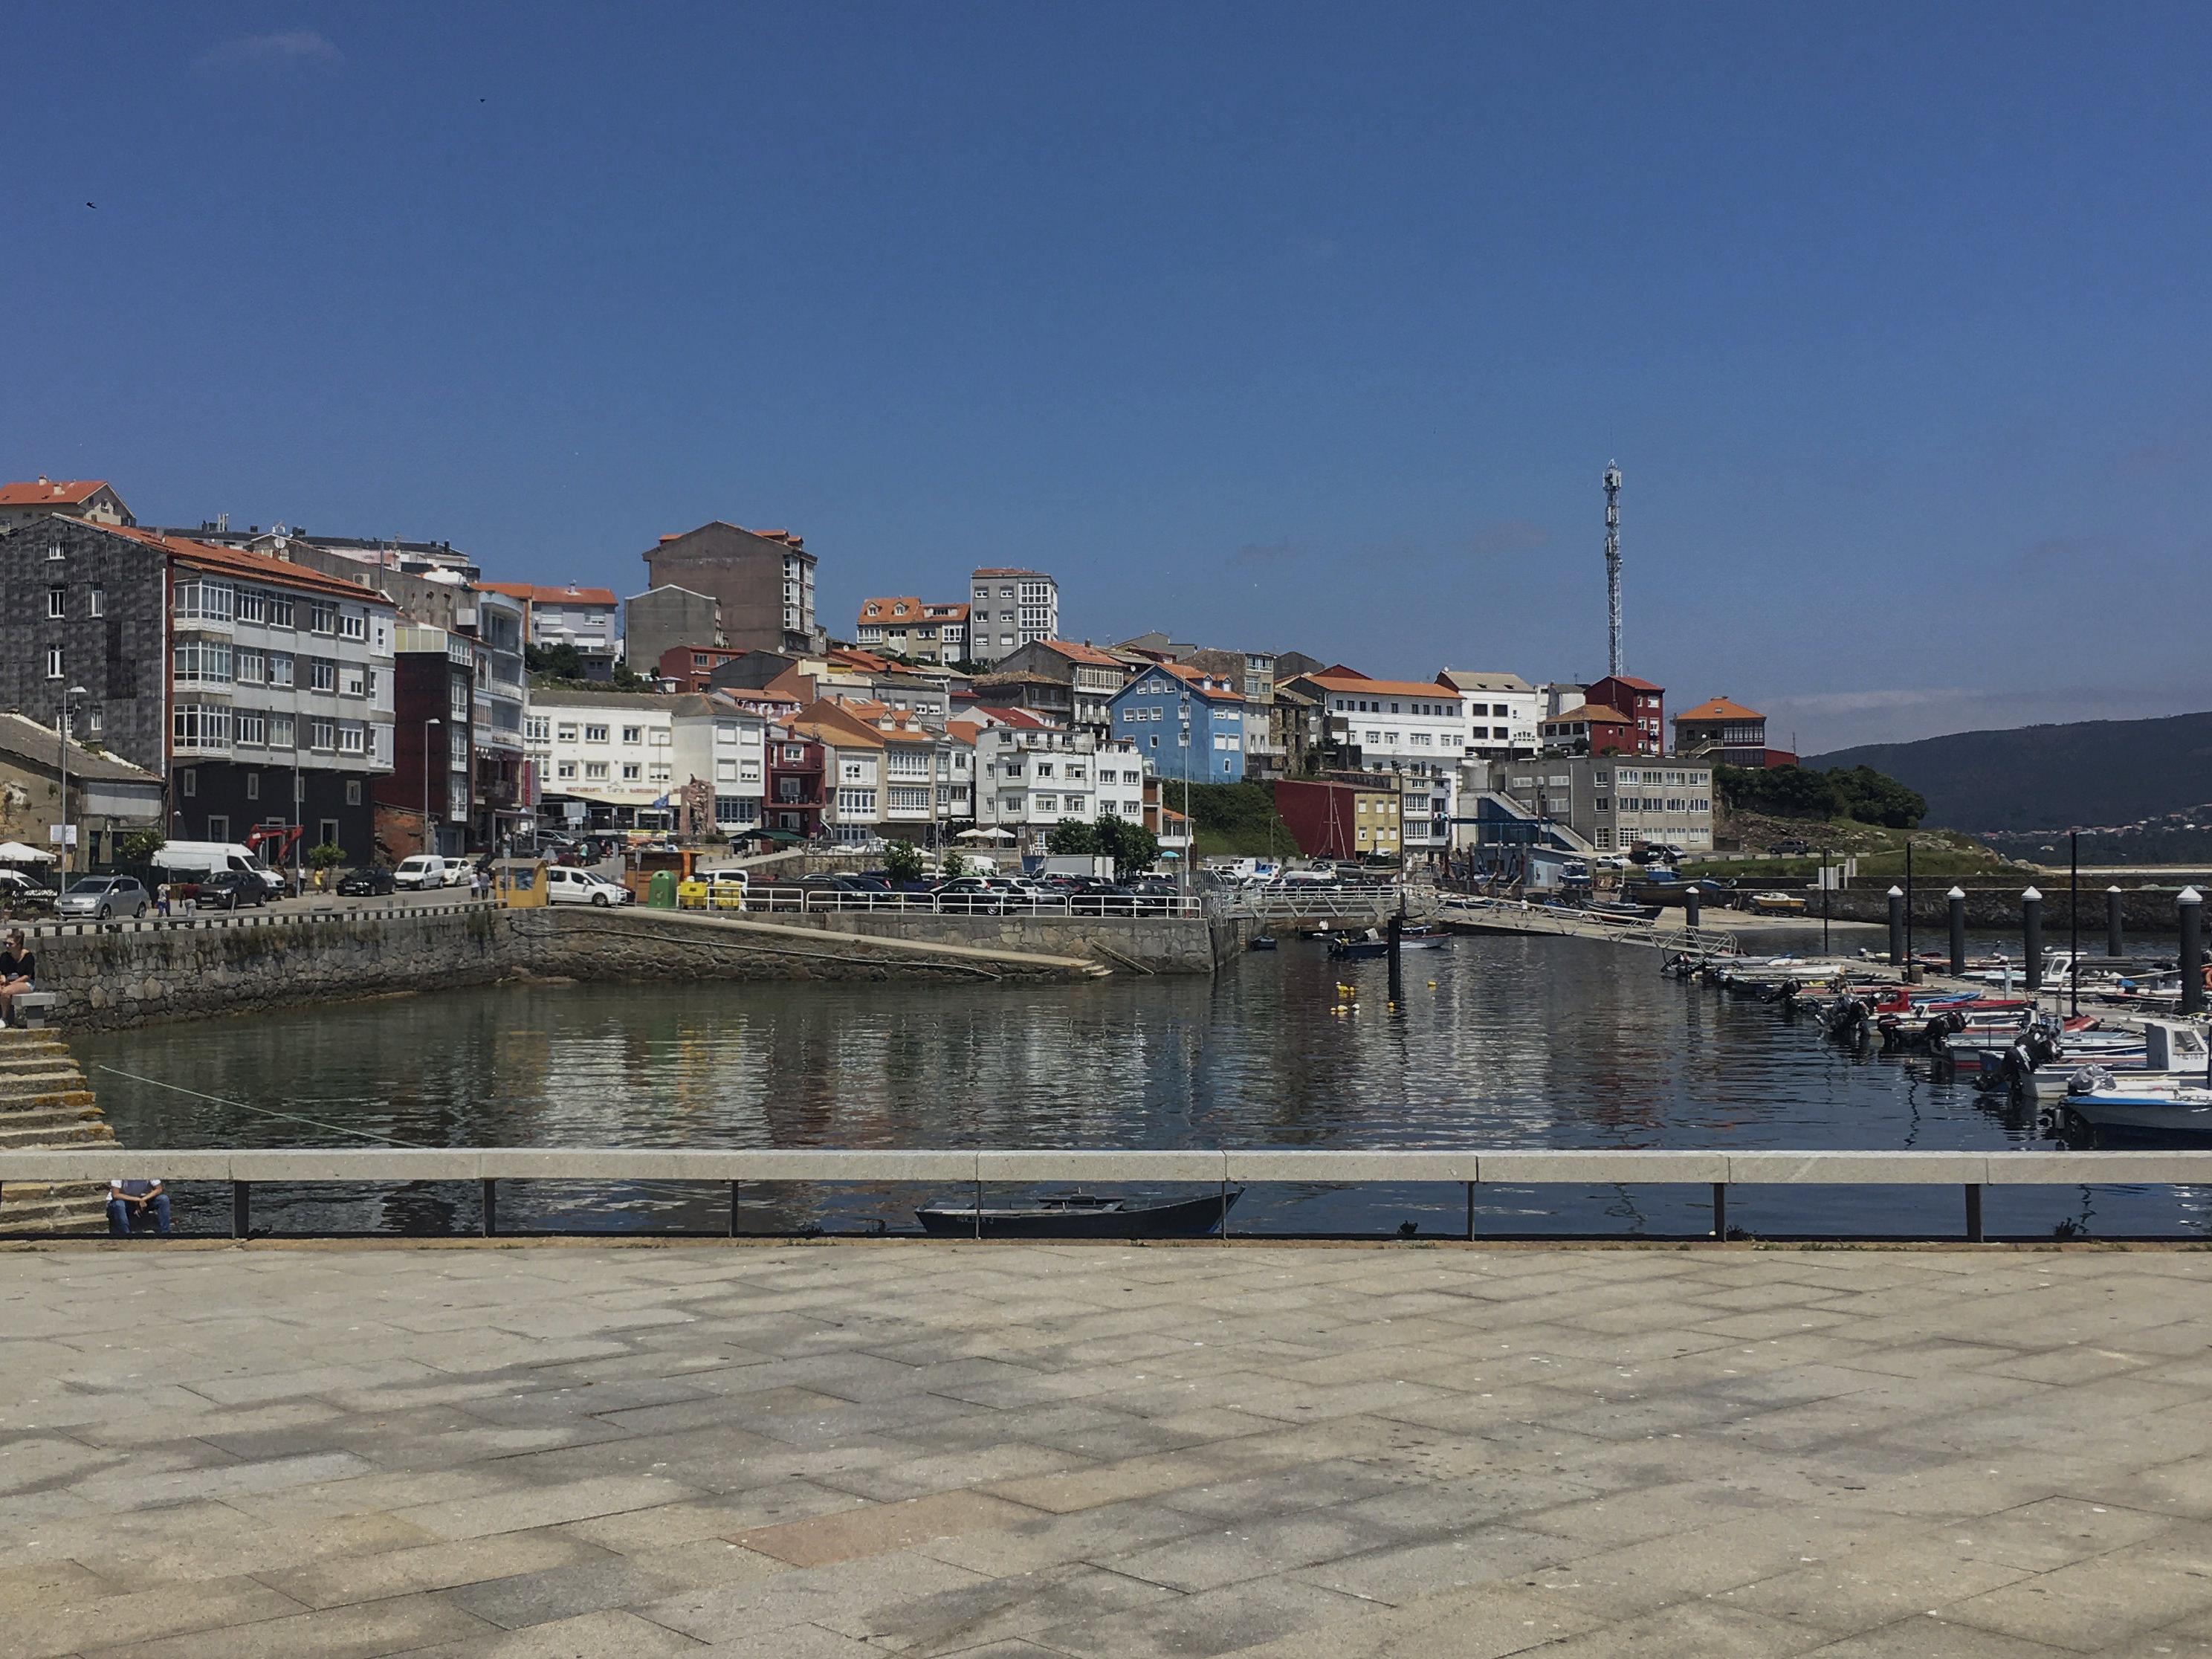 Coastal Village of Muros, Spain